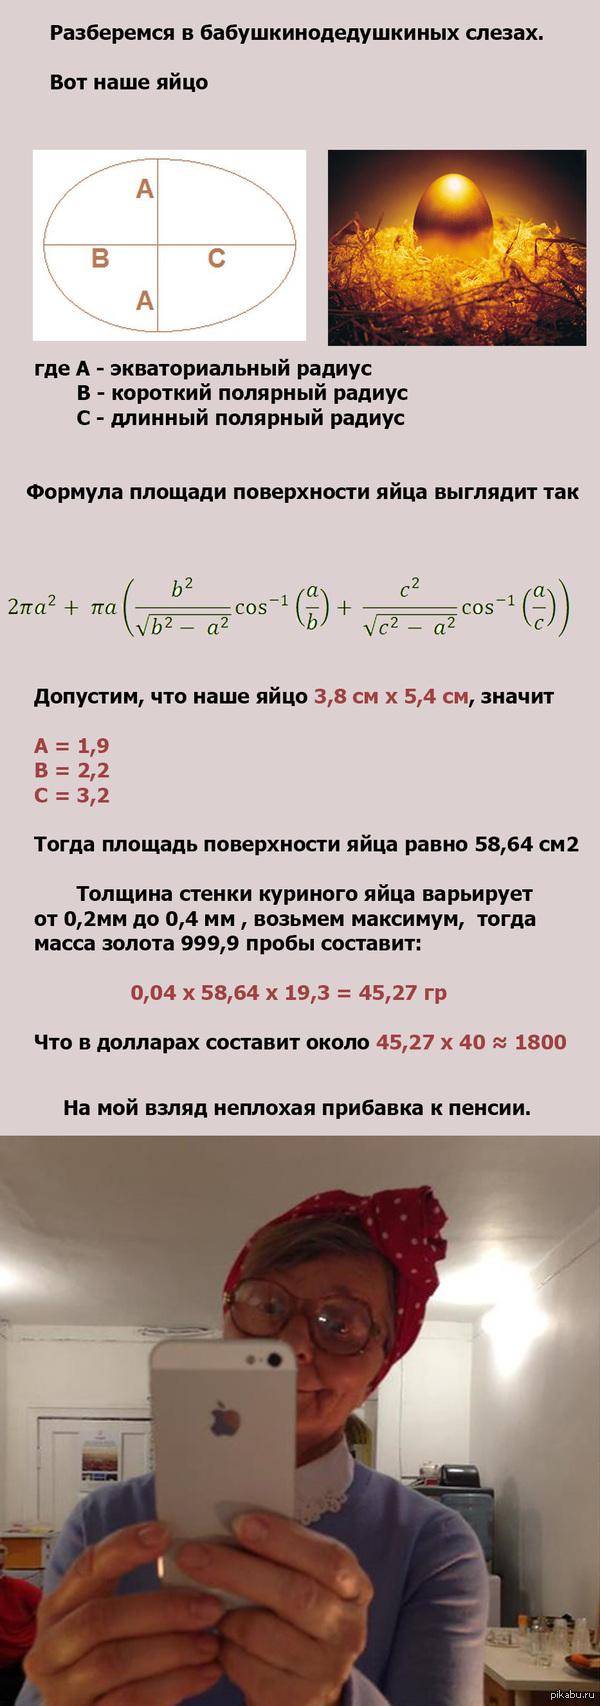 "Стоит ли плакать. навеяно <a href=""http://pikabu.ru/story/gde_logika_gde_ideya_2776778#comment_36034957"">#comment_36034957</a>"